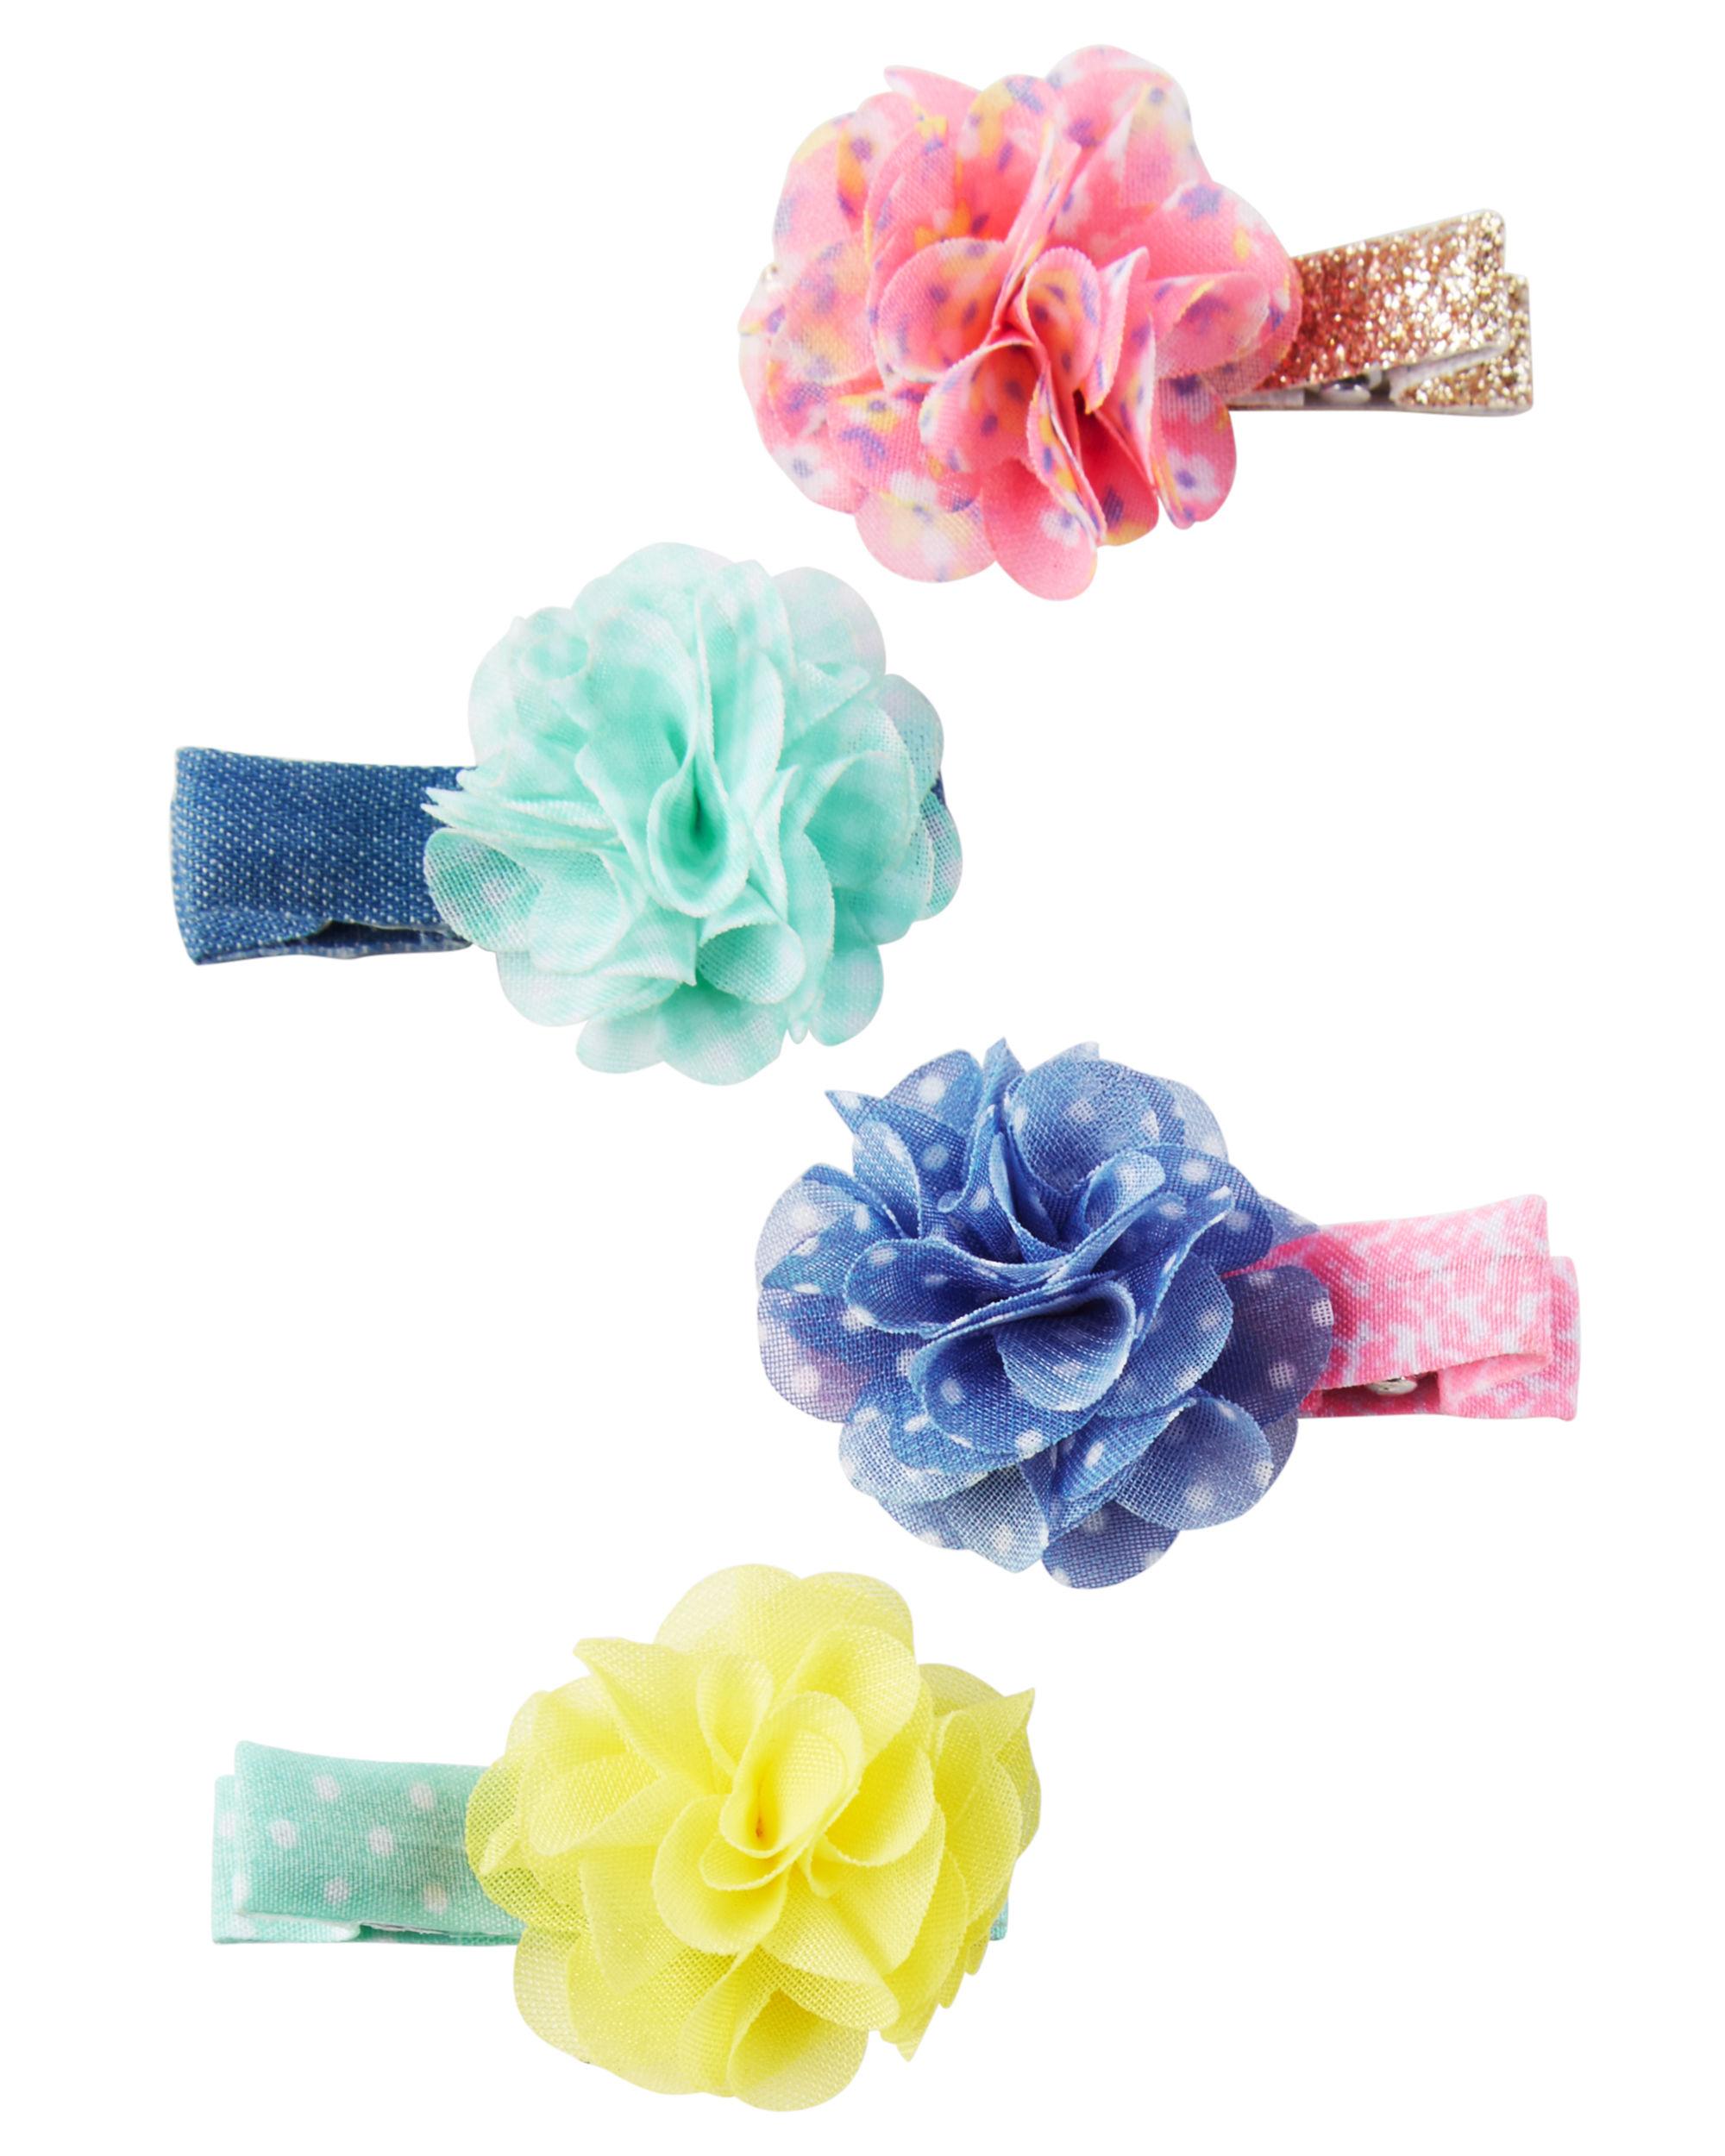 carter's hair clips